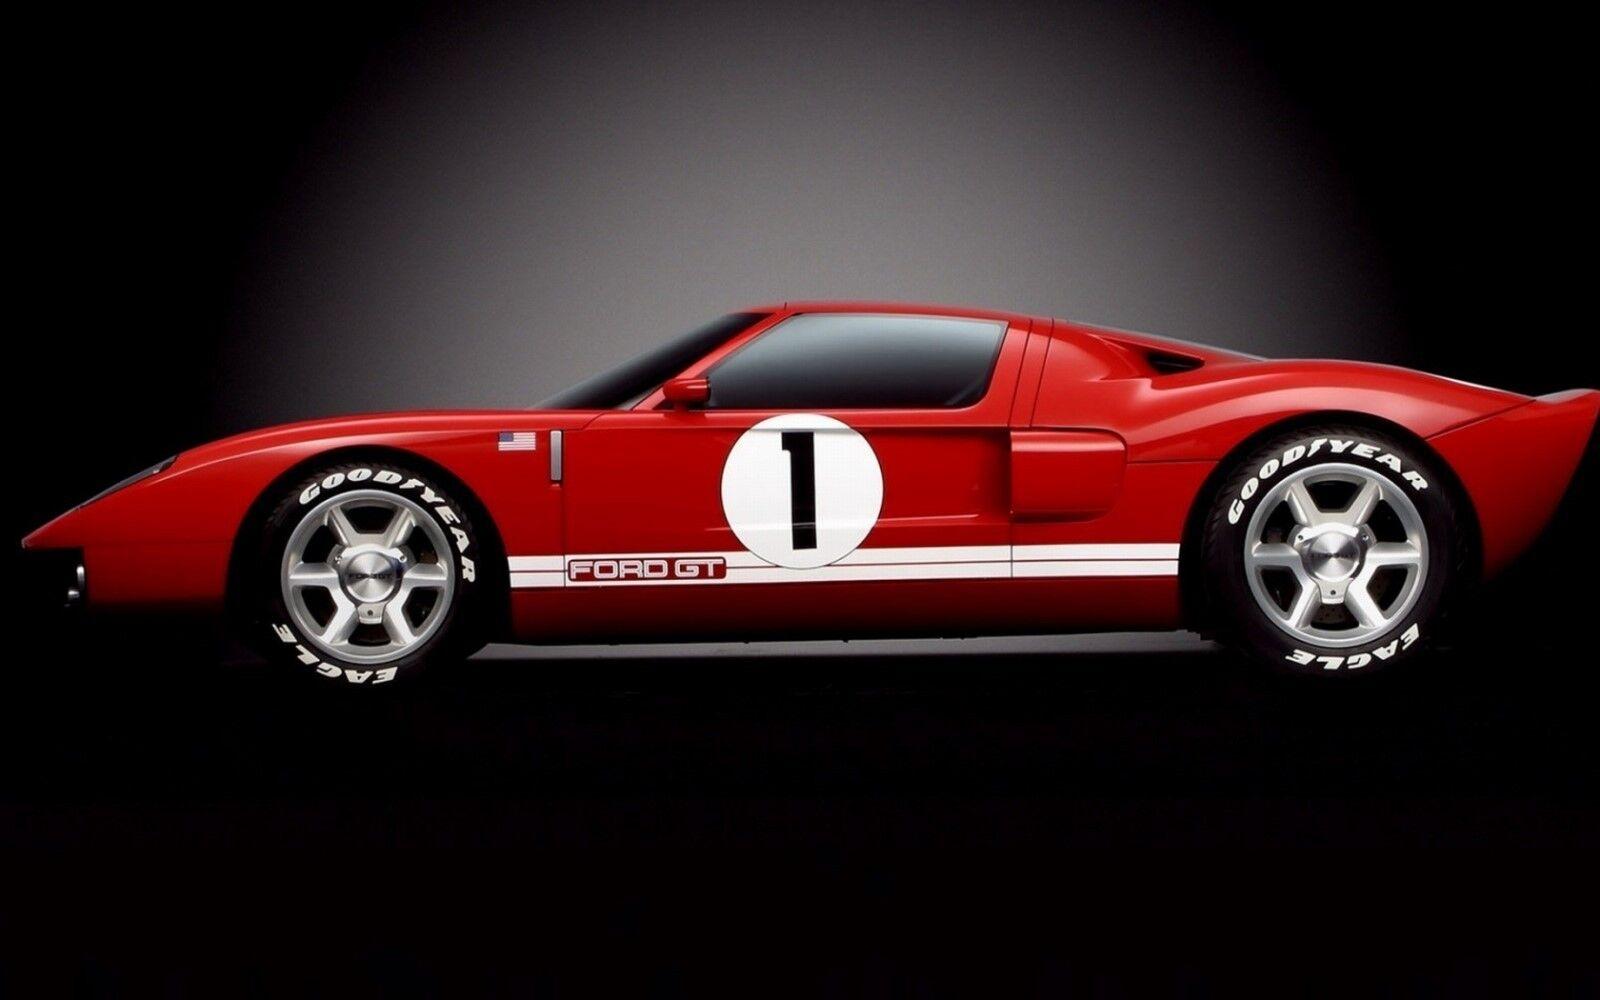 Car Ford GT Sport Sport Sport 24 Race  GT40 1 18 f gp 12 Carousel Red 1969 c3029c